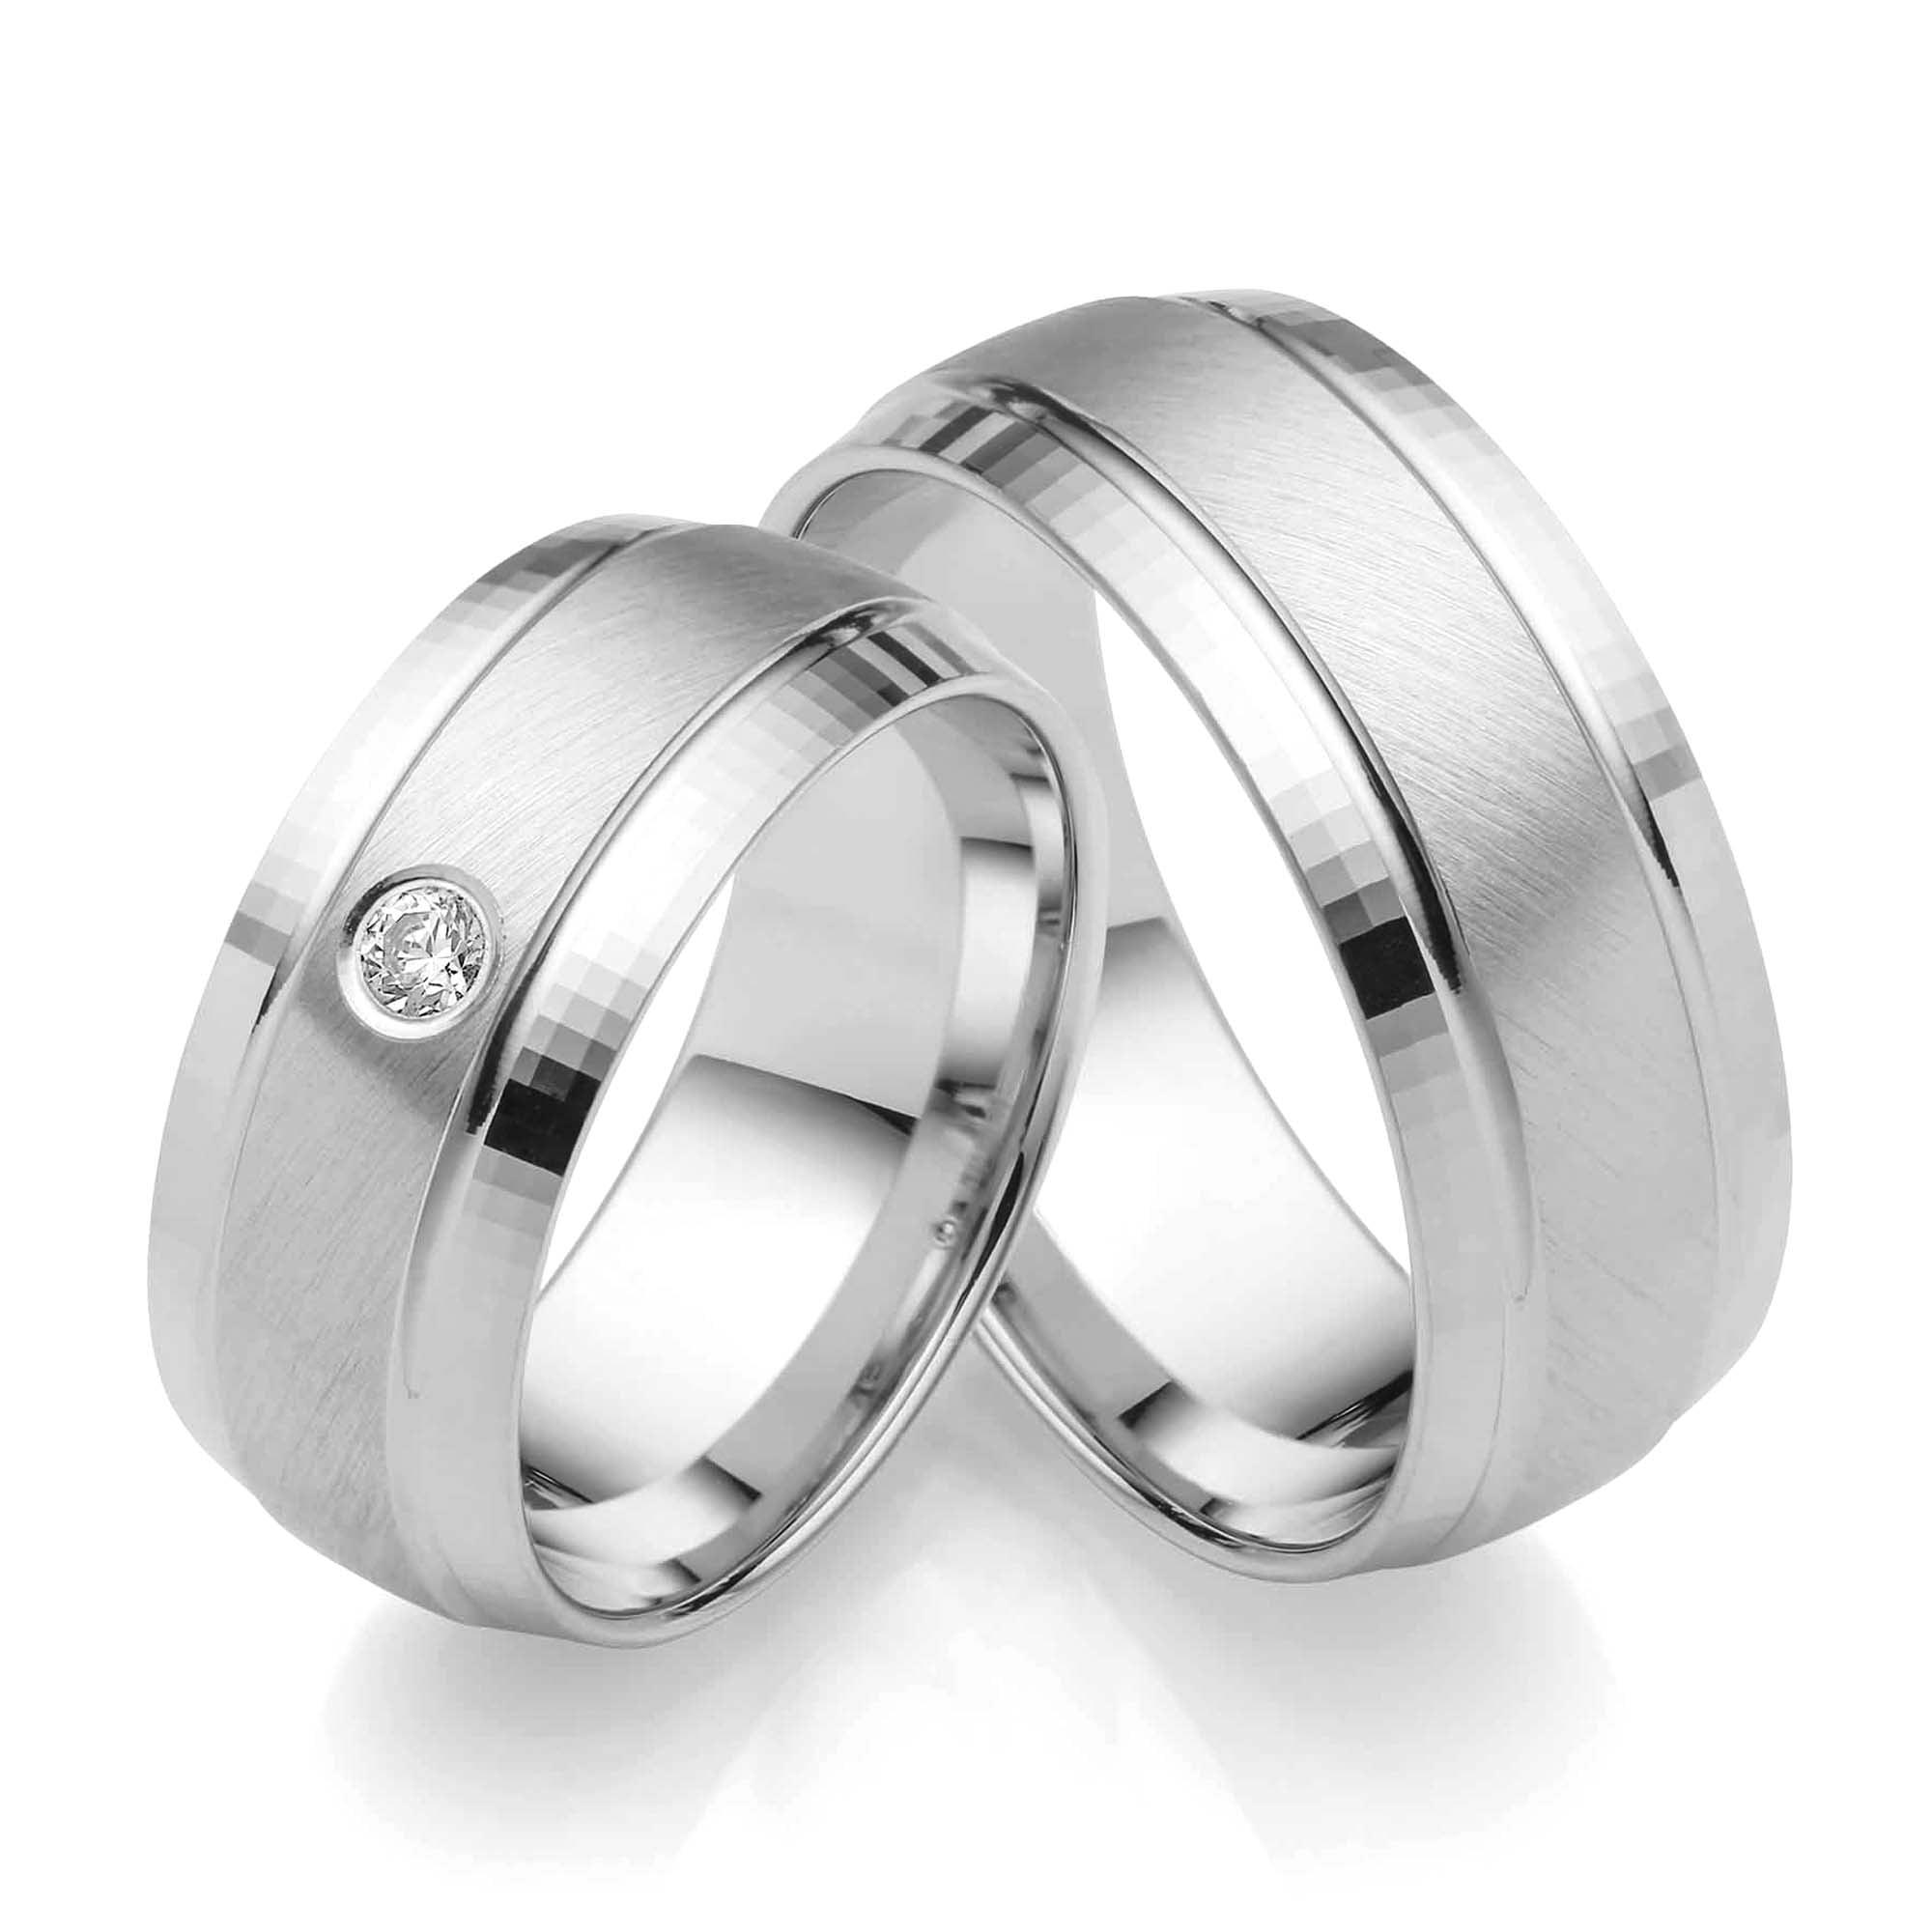 Juwelier Kraemer Freundschaftsringe 925 Silber 60 Mm Juwelier